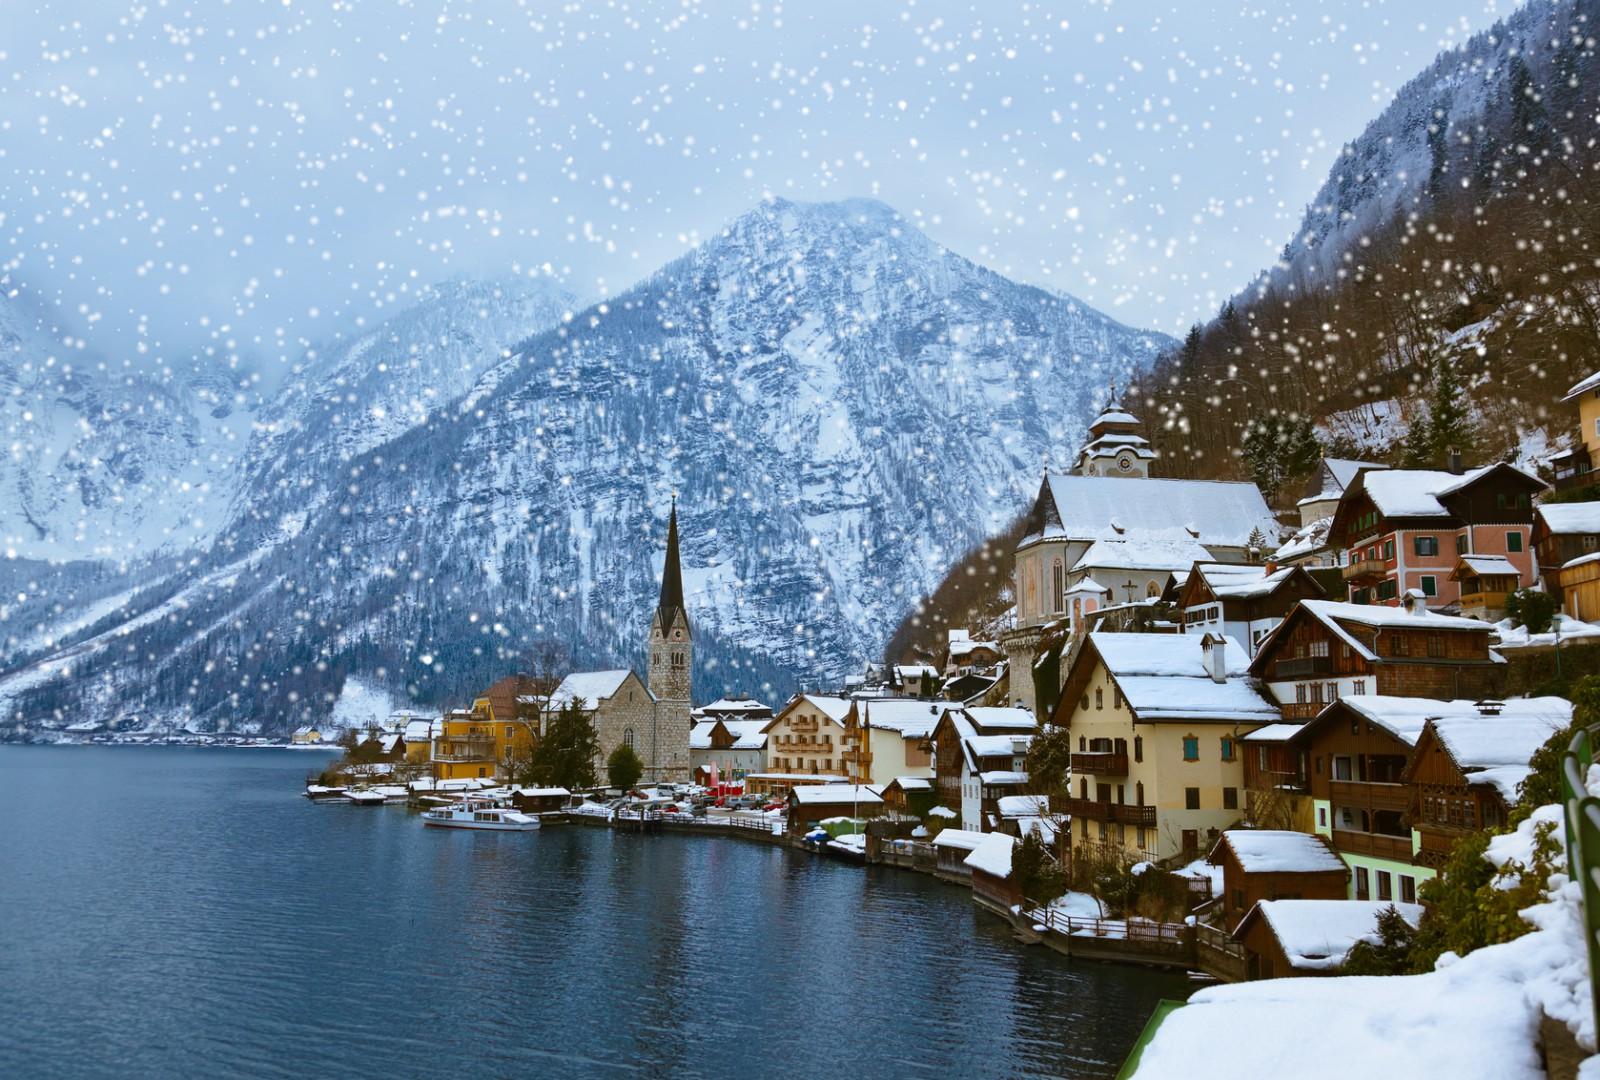 pueblos europeos de postal Village Hallstatt on the lake - Salzburg Austria